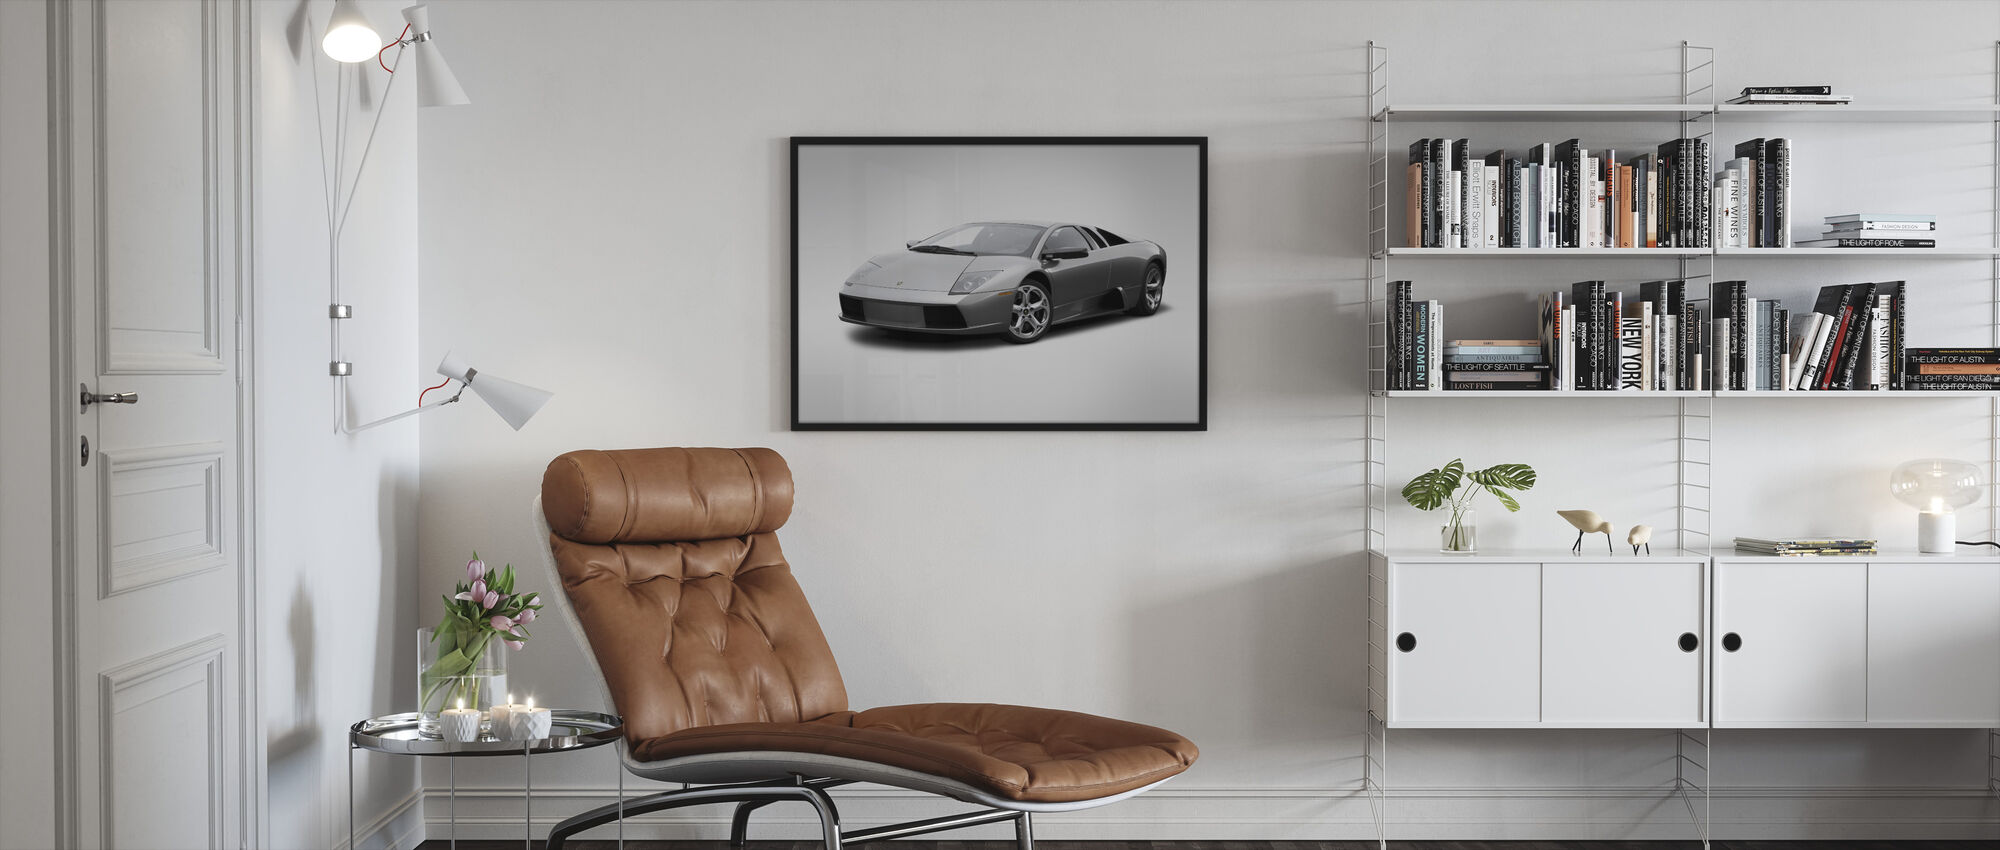 Lamborghini - Indrammet billede - Stue